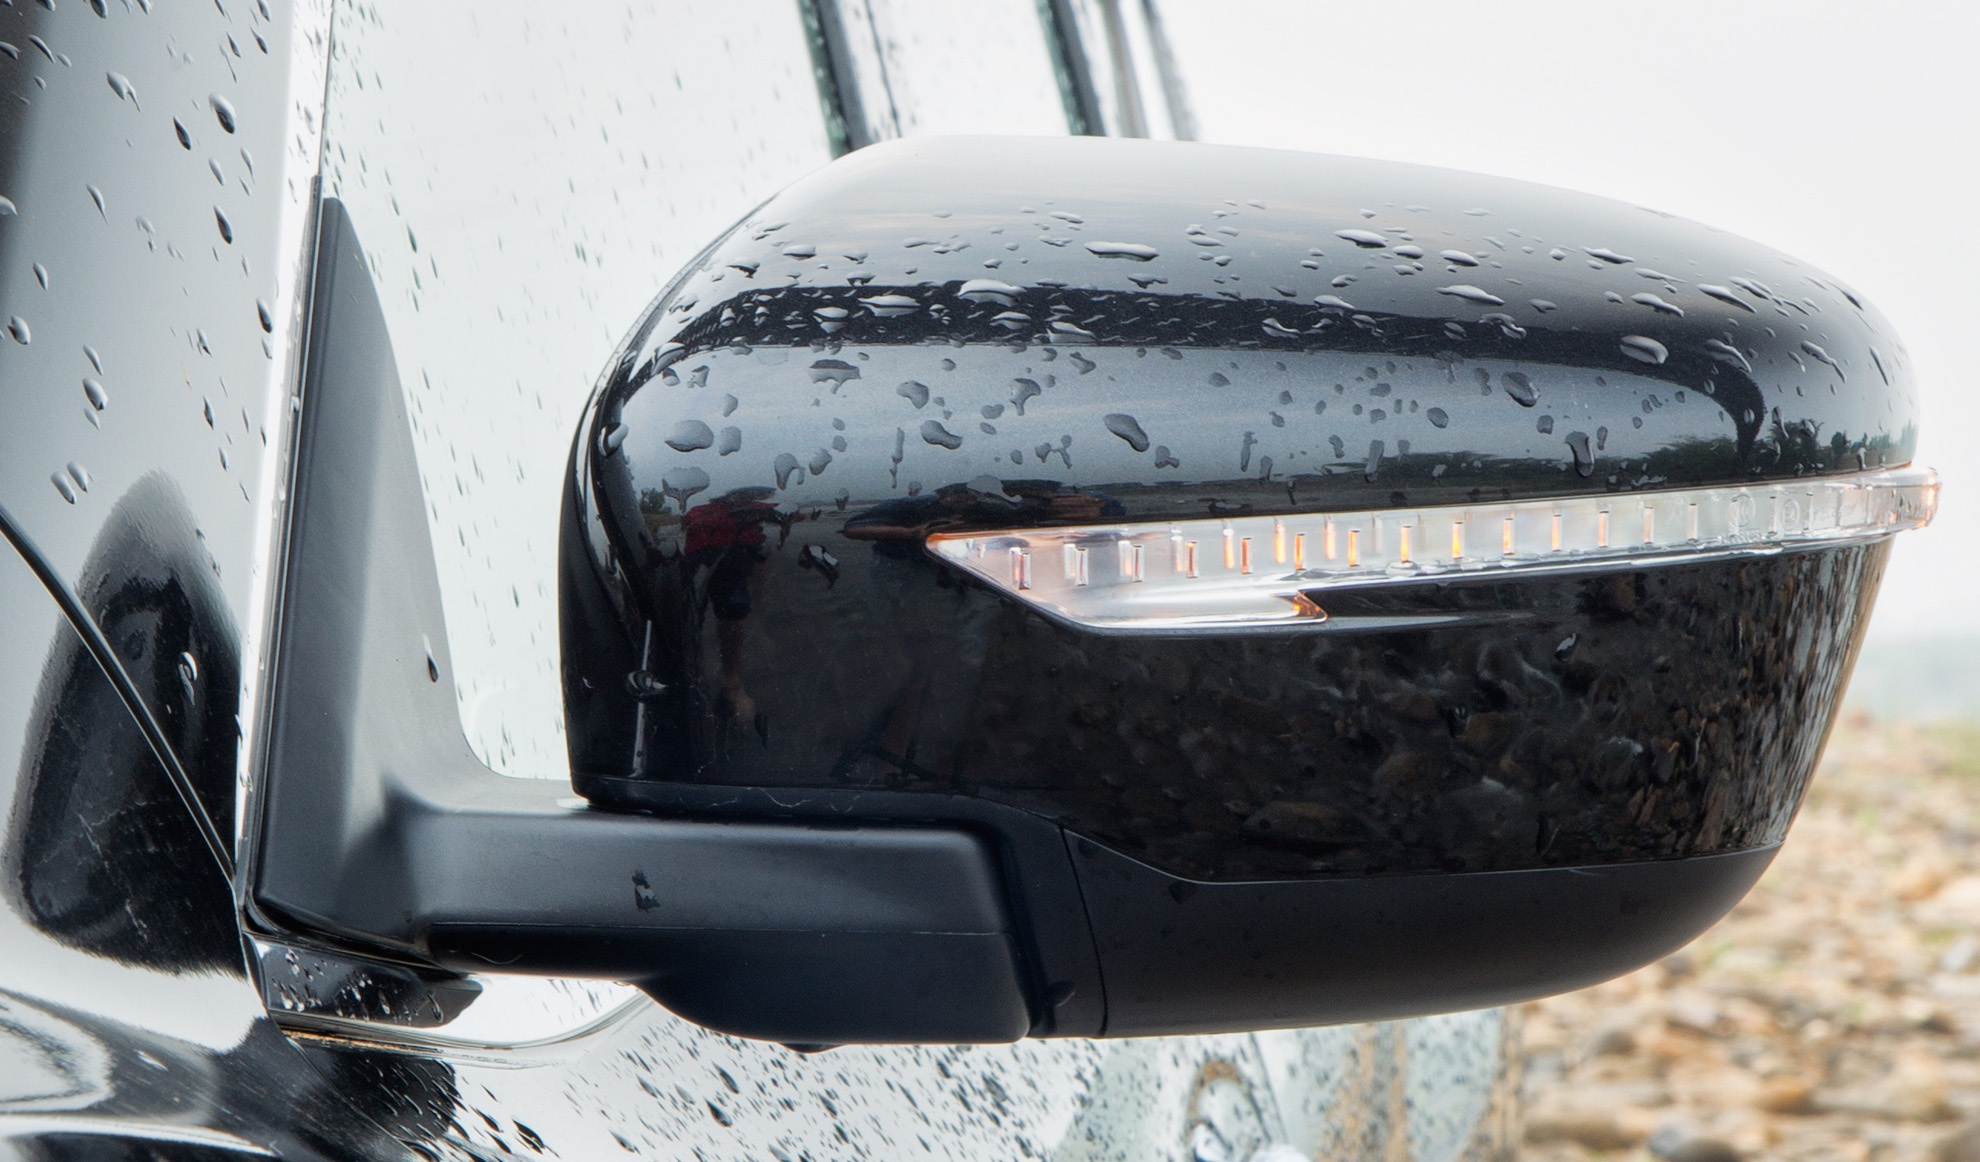 Danh gia Nissan X-Trail: Chay dua ve gia va cong nghe an toan hinh anh 7